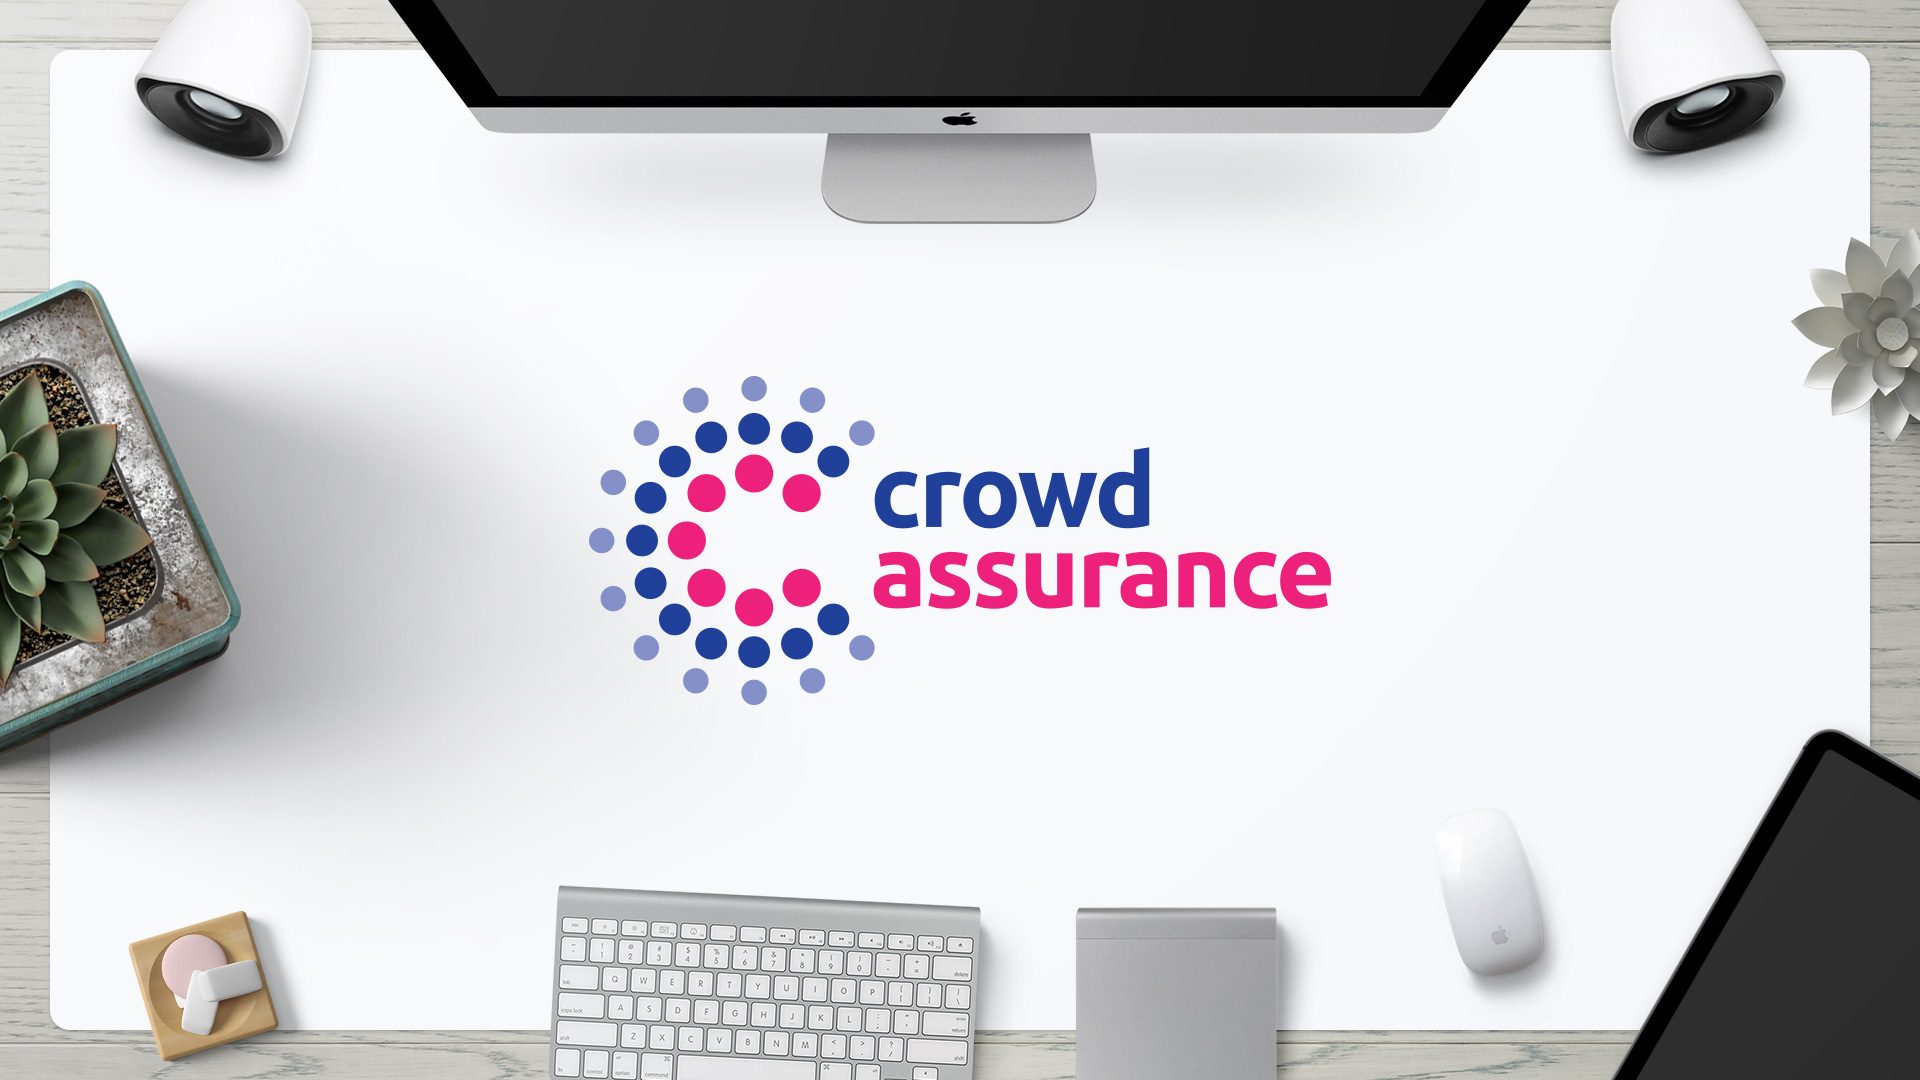 Création logo assurance crowdfinance crowdlending crowdfunding